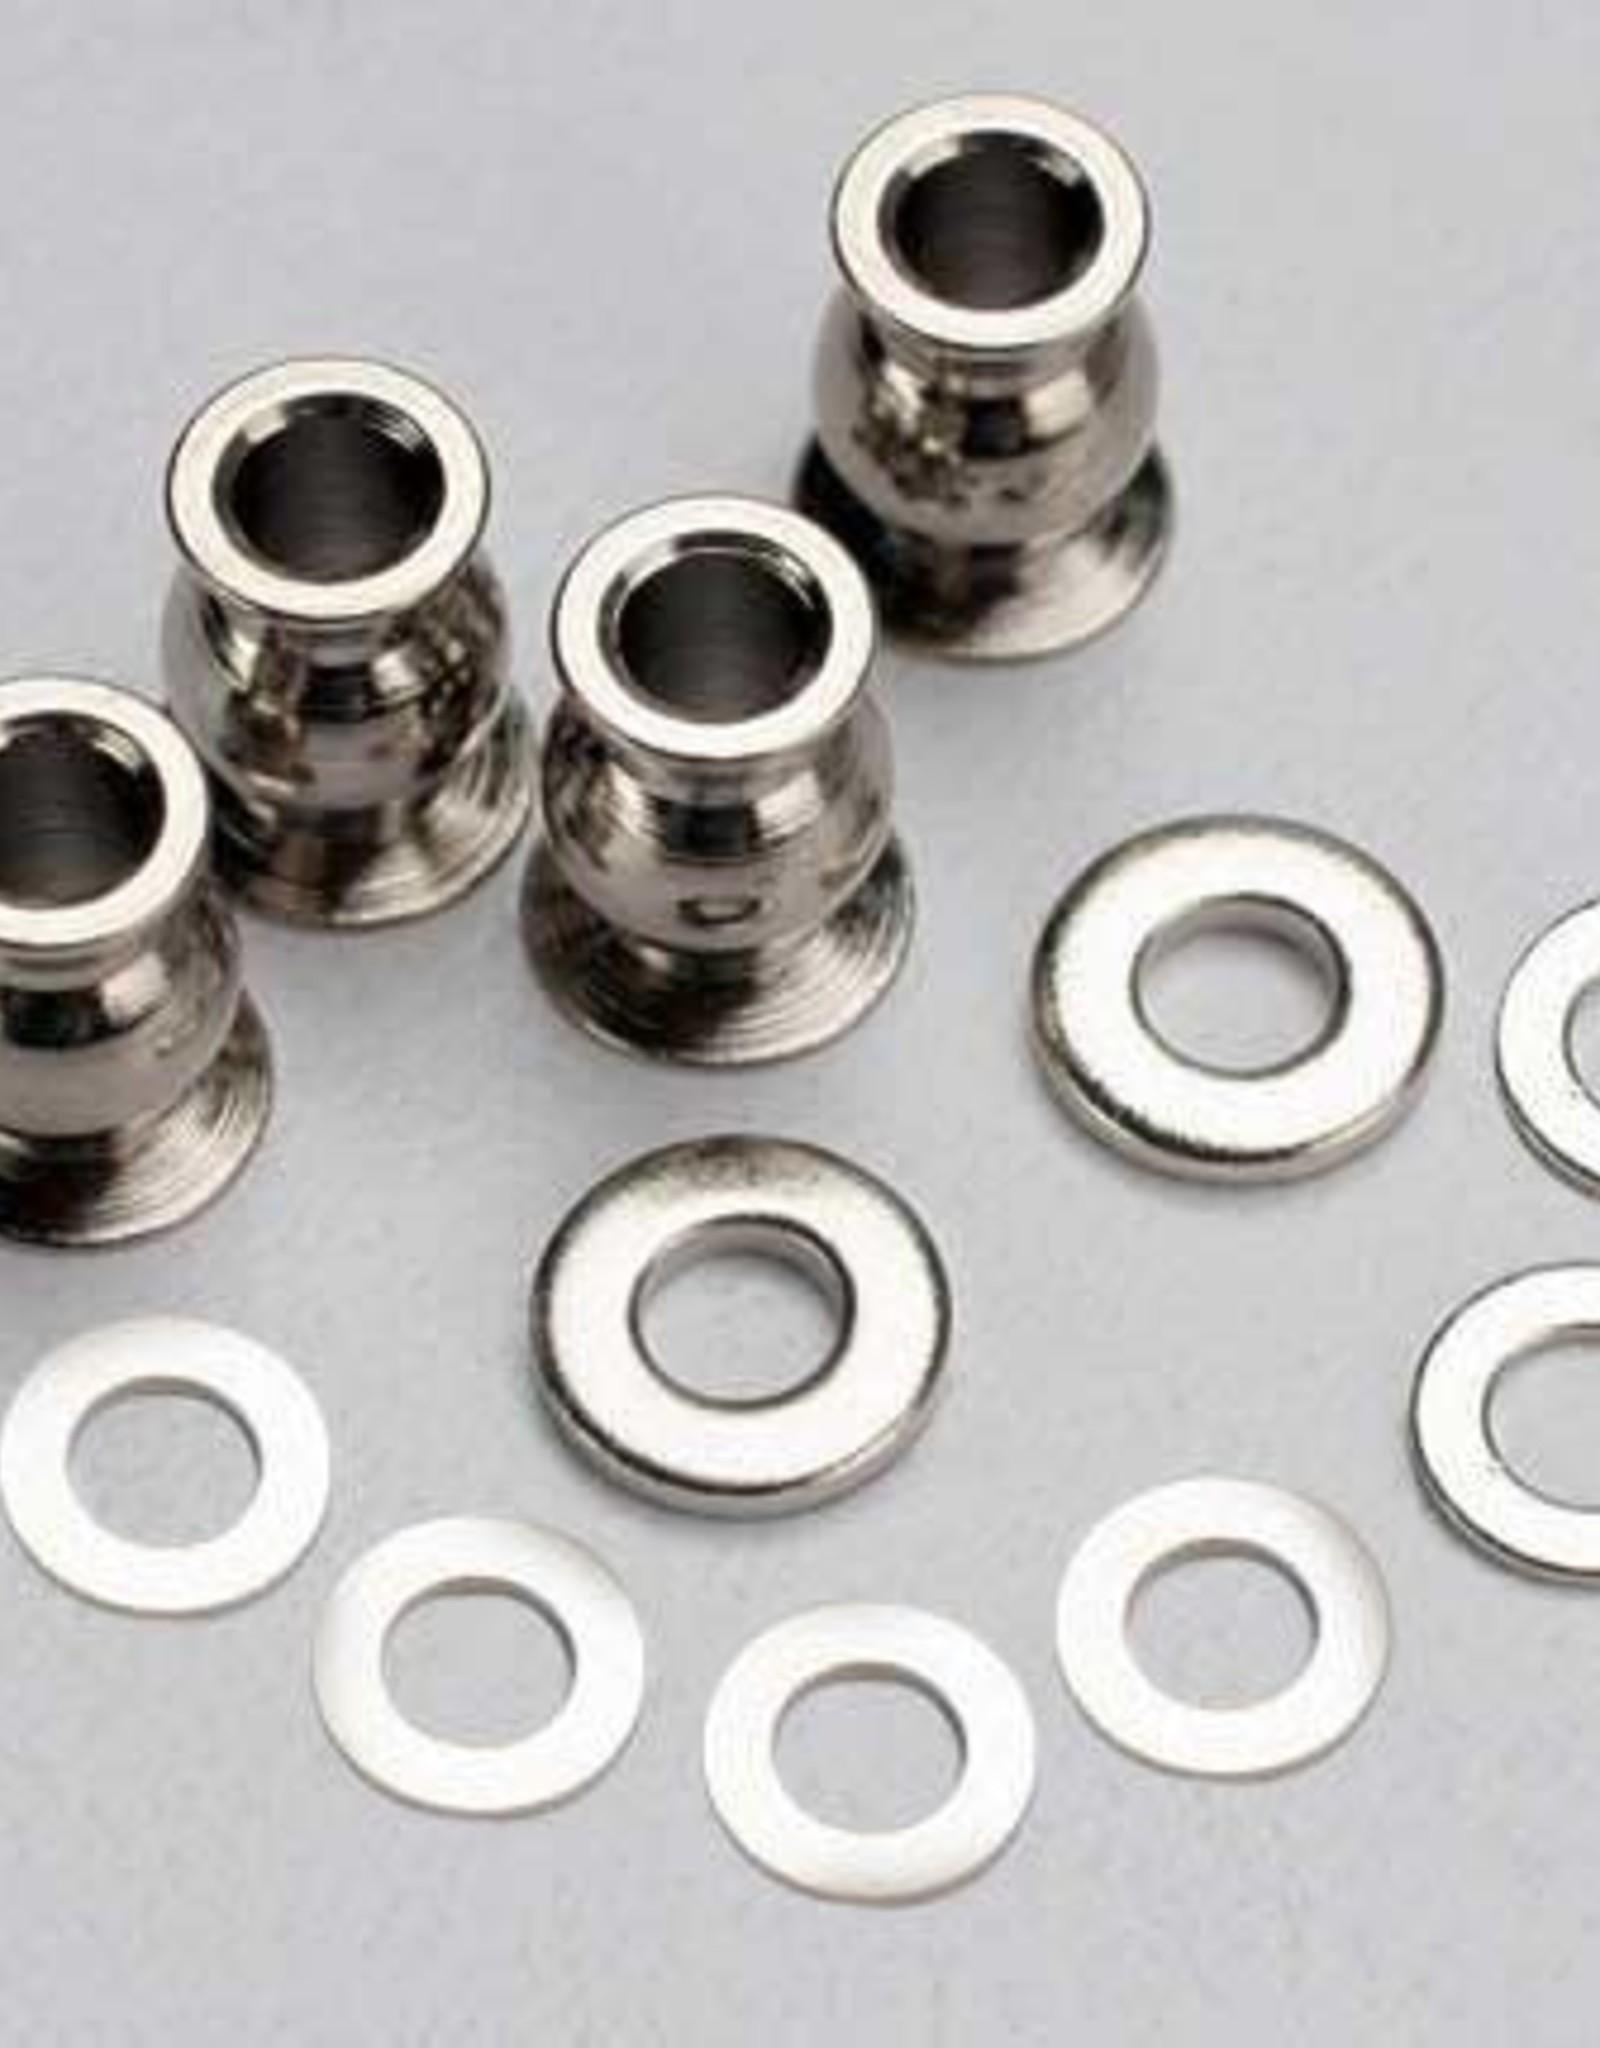 TRAXXAS SHIM SET/HALLOW BALLS (4) Shim set, 3x7x1mm (2), 3x6x0.5mm (4), 3x7x2mm (2)/ hollow balls, captured (4)